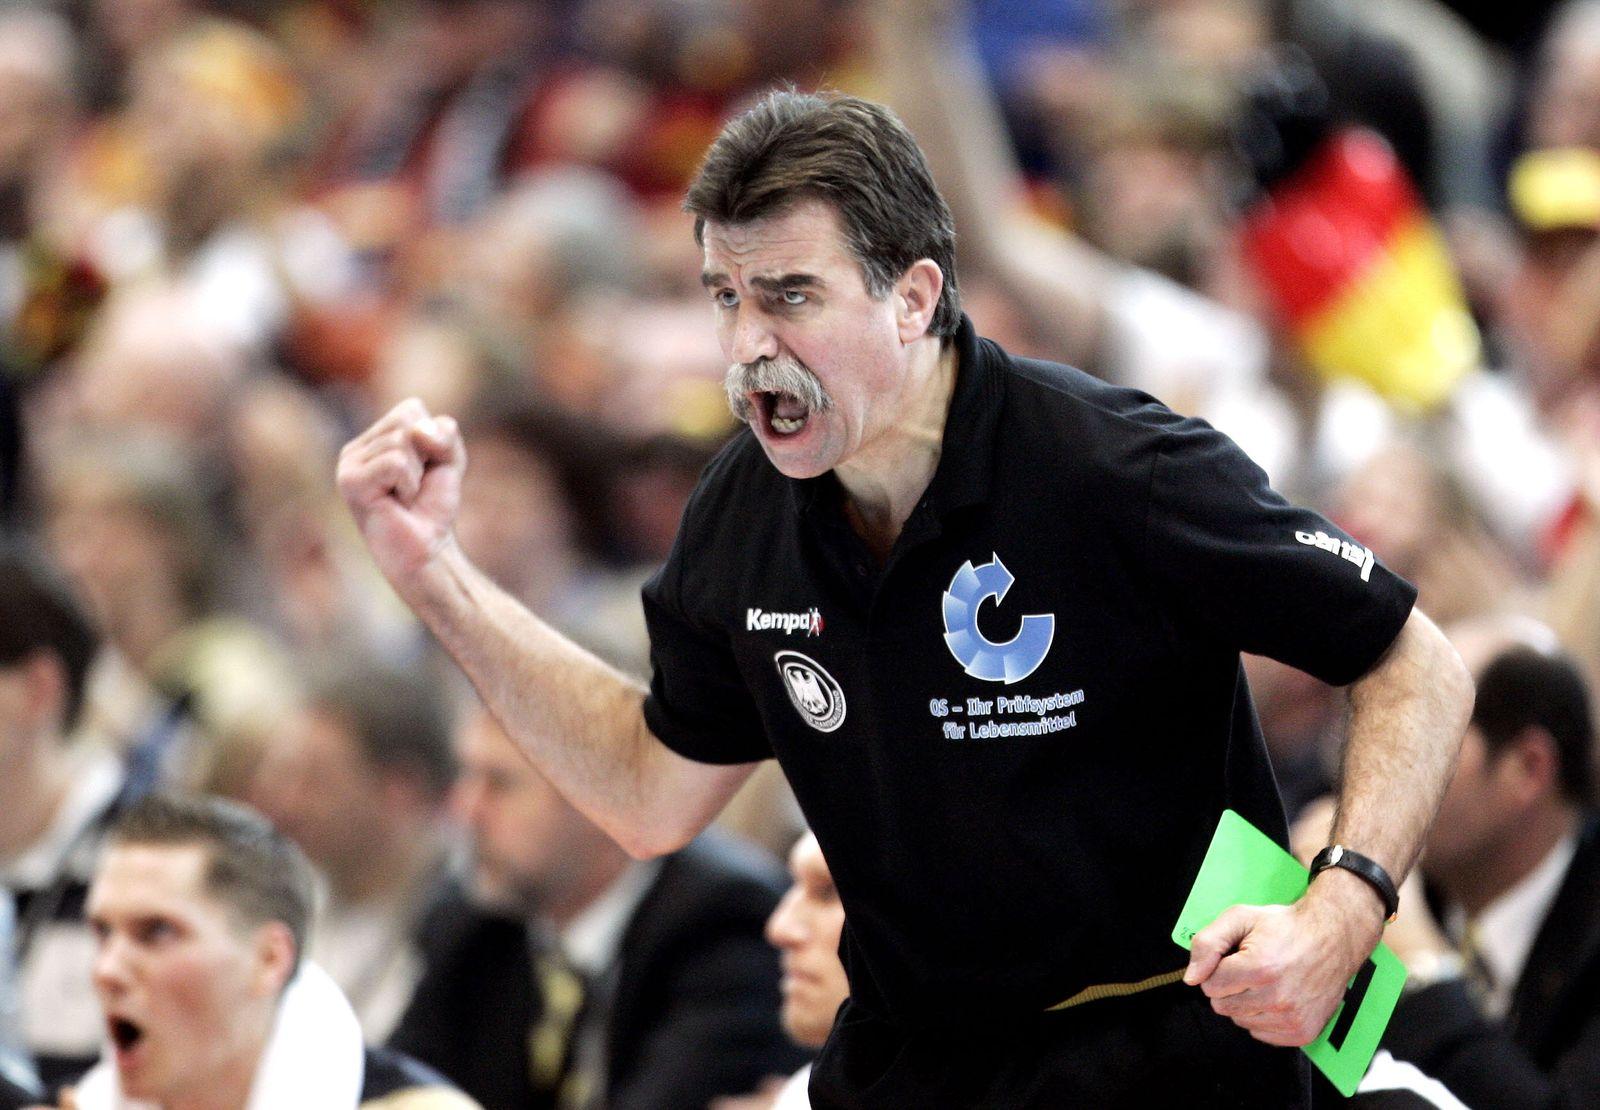 Handball WM/ 2007/ Heiner Brand